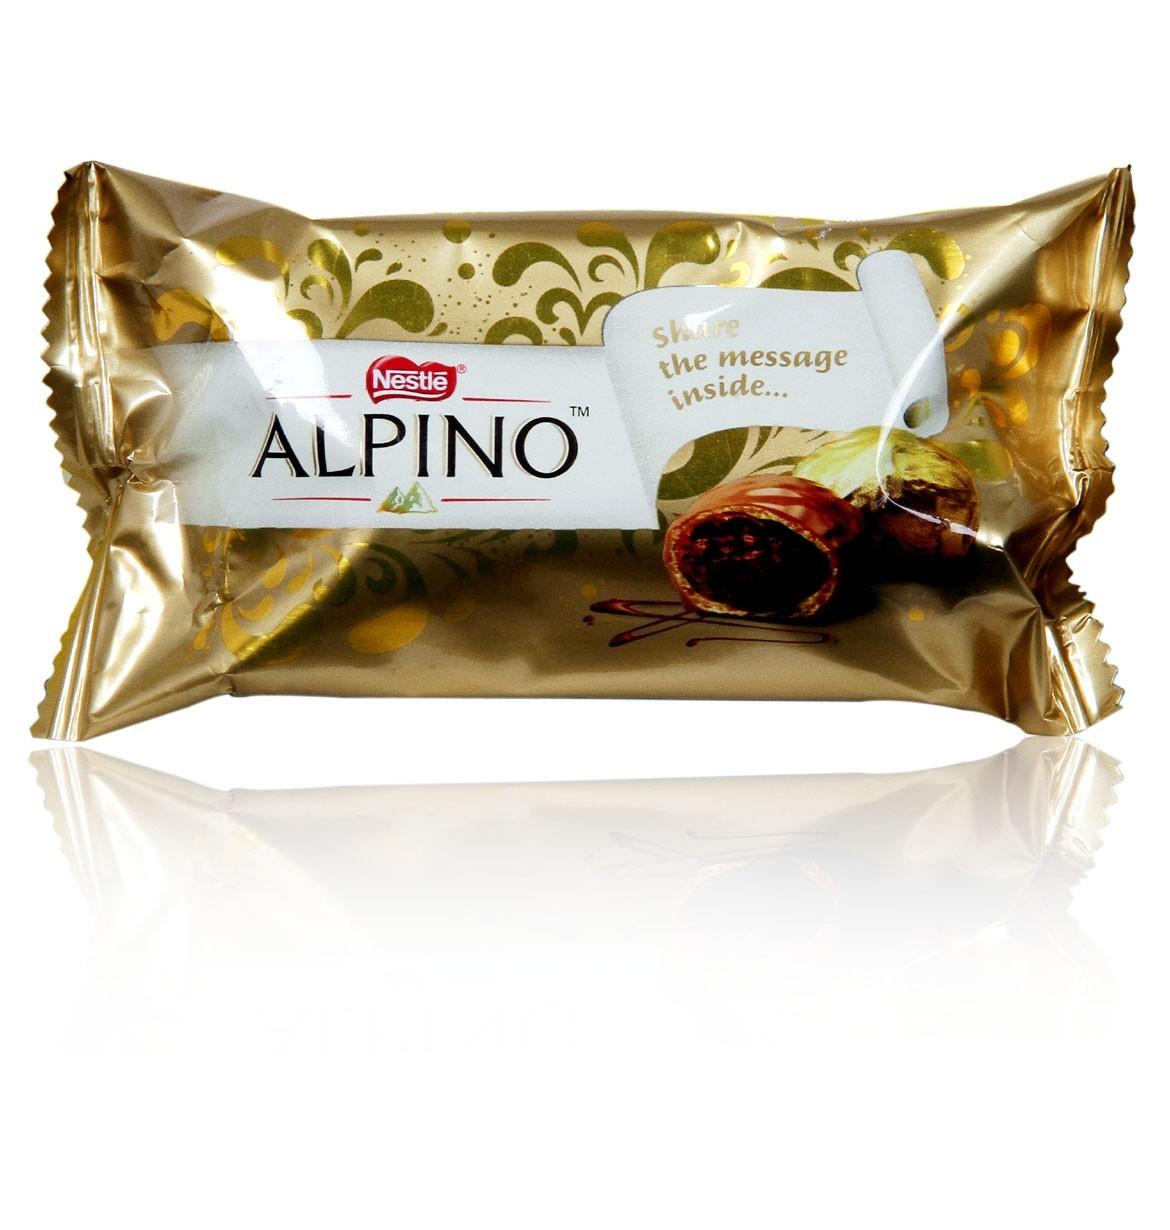 Nestle Alpino Milk Chocolate Image